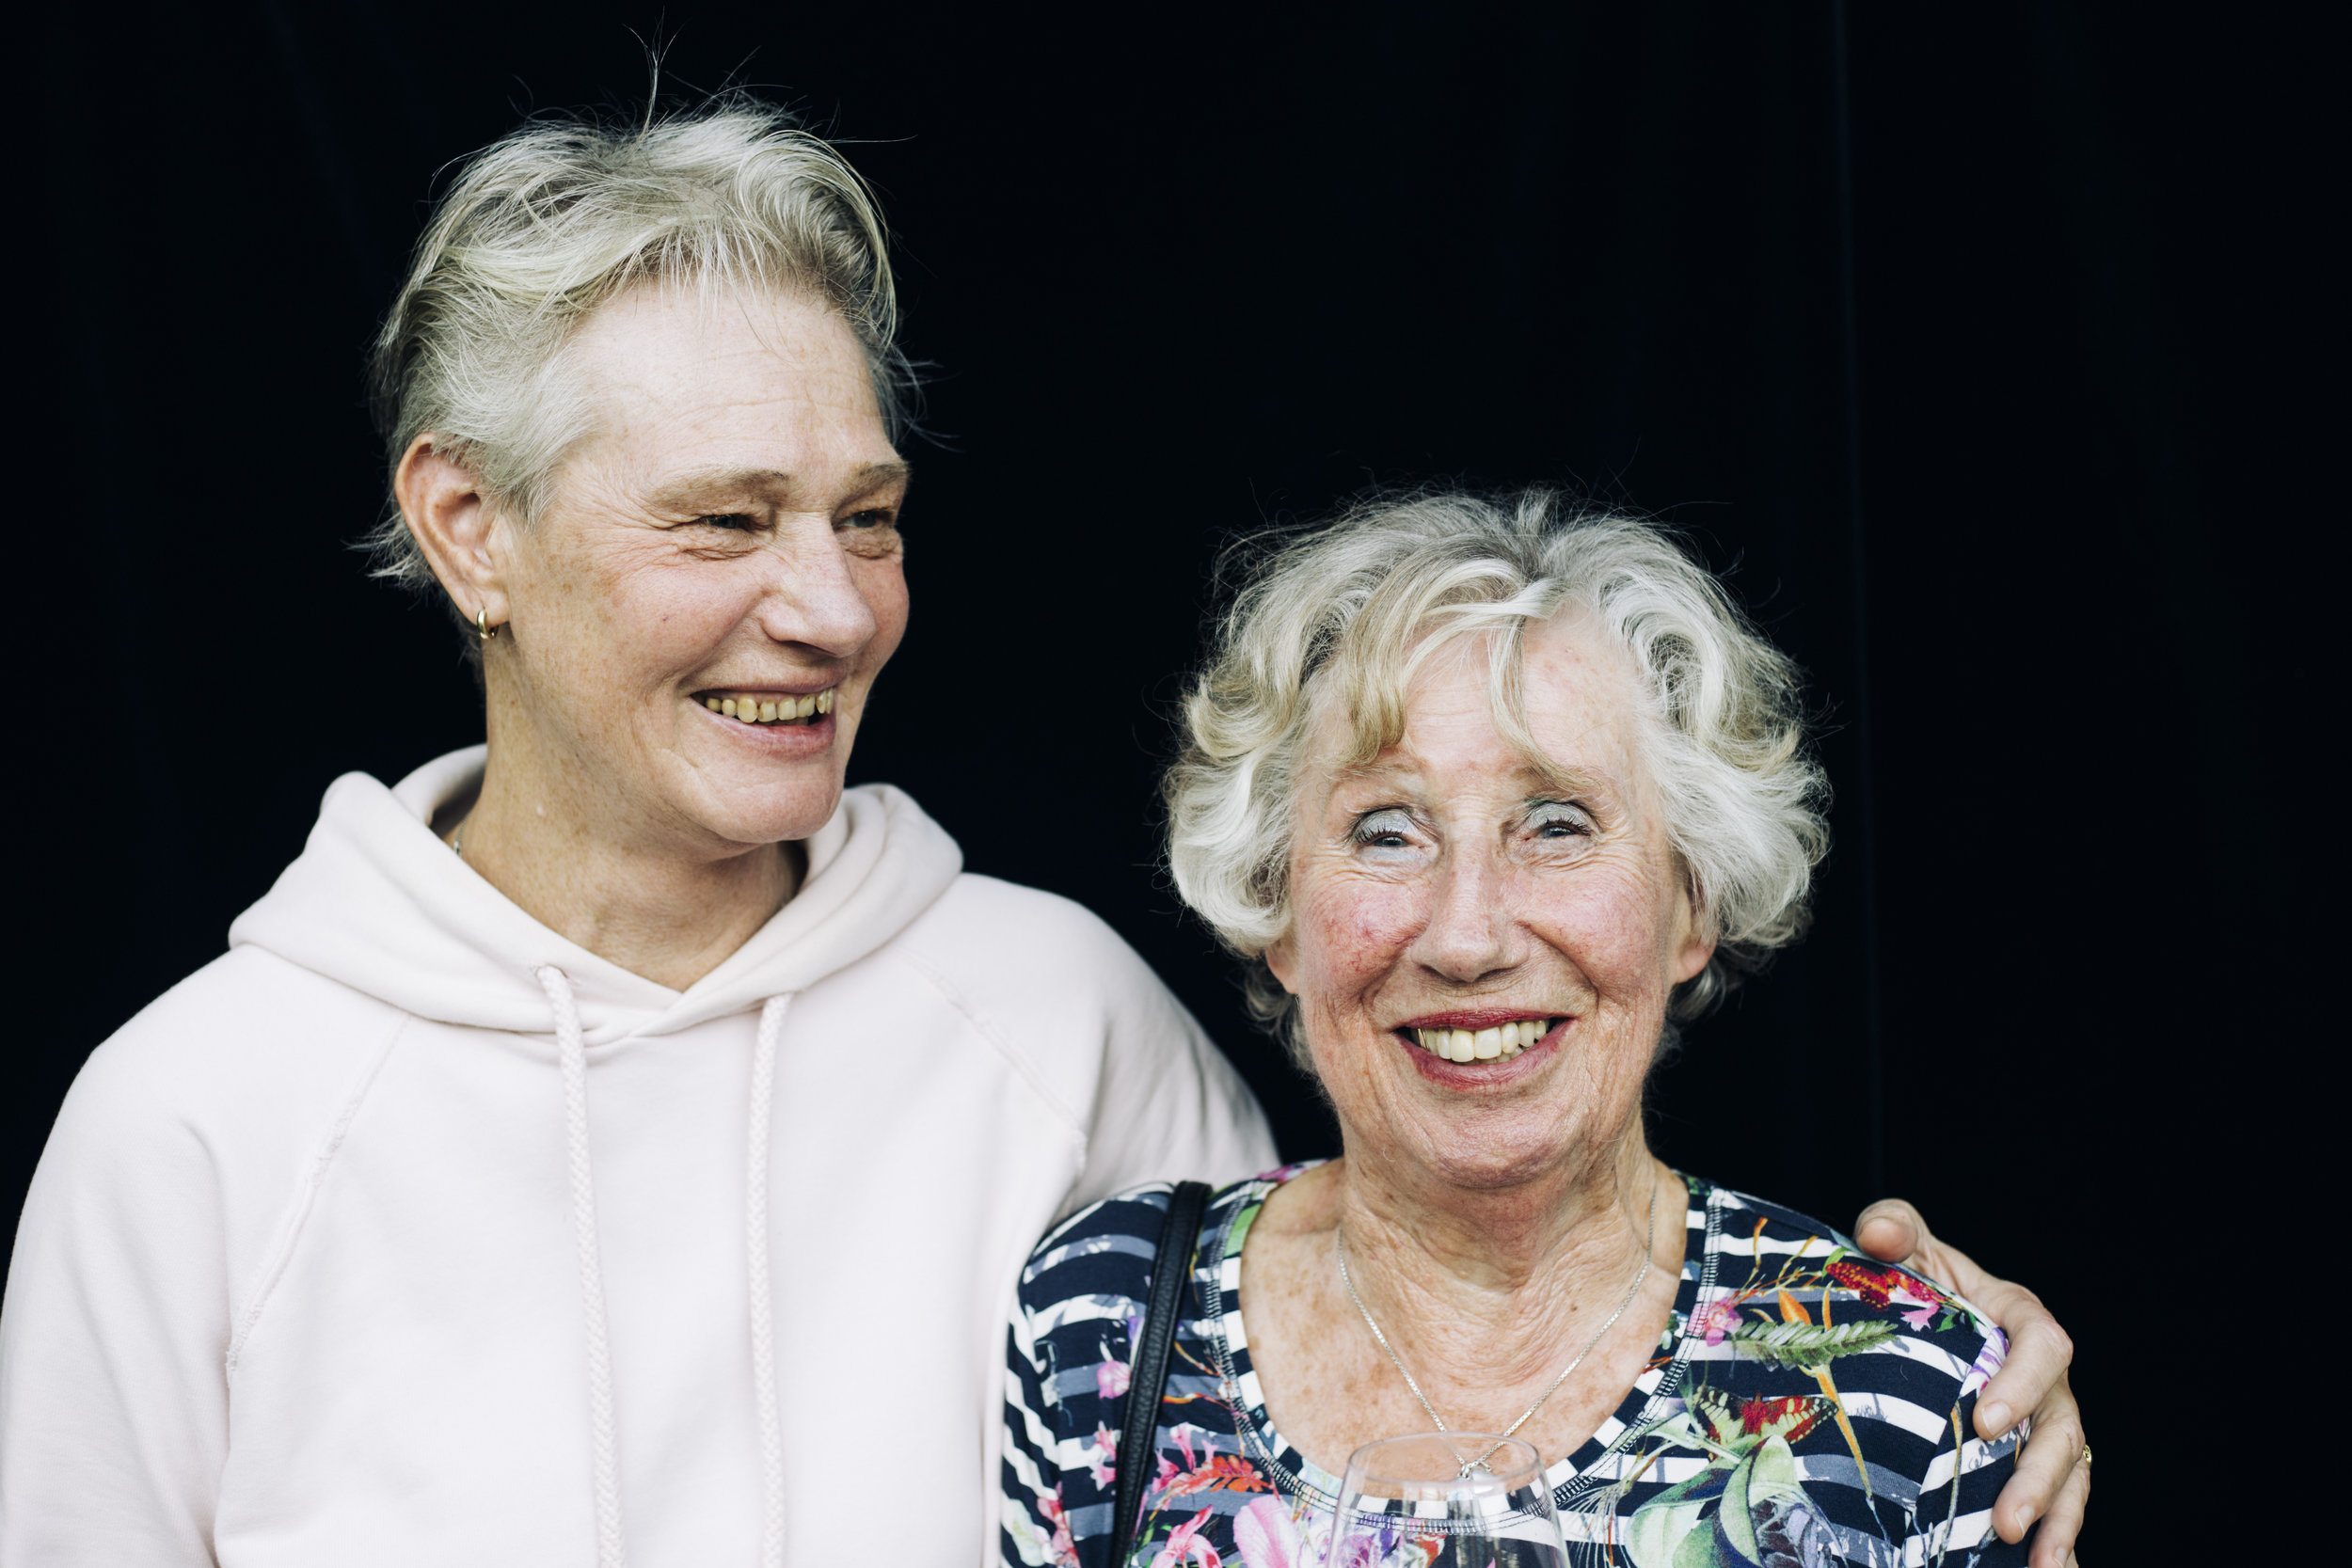 Anita & Geertje. Sportdocent en deelnemer.